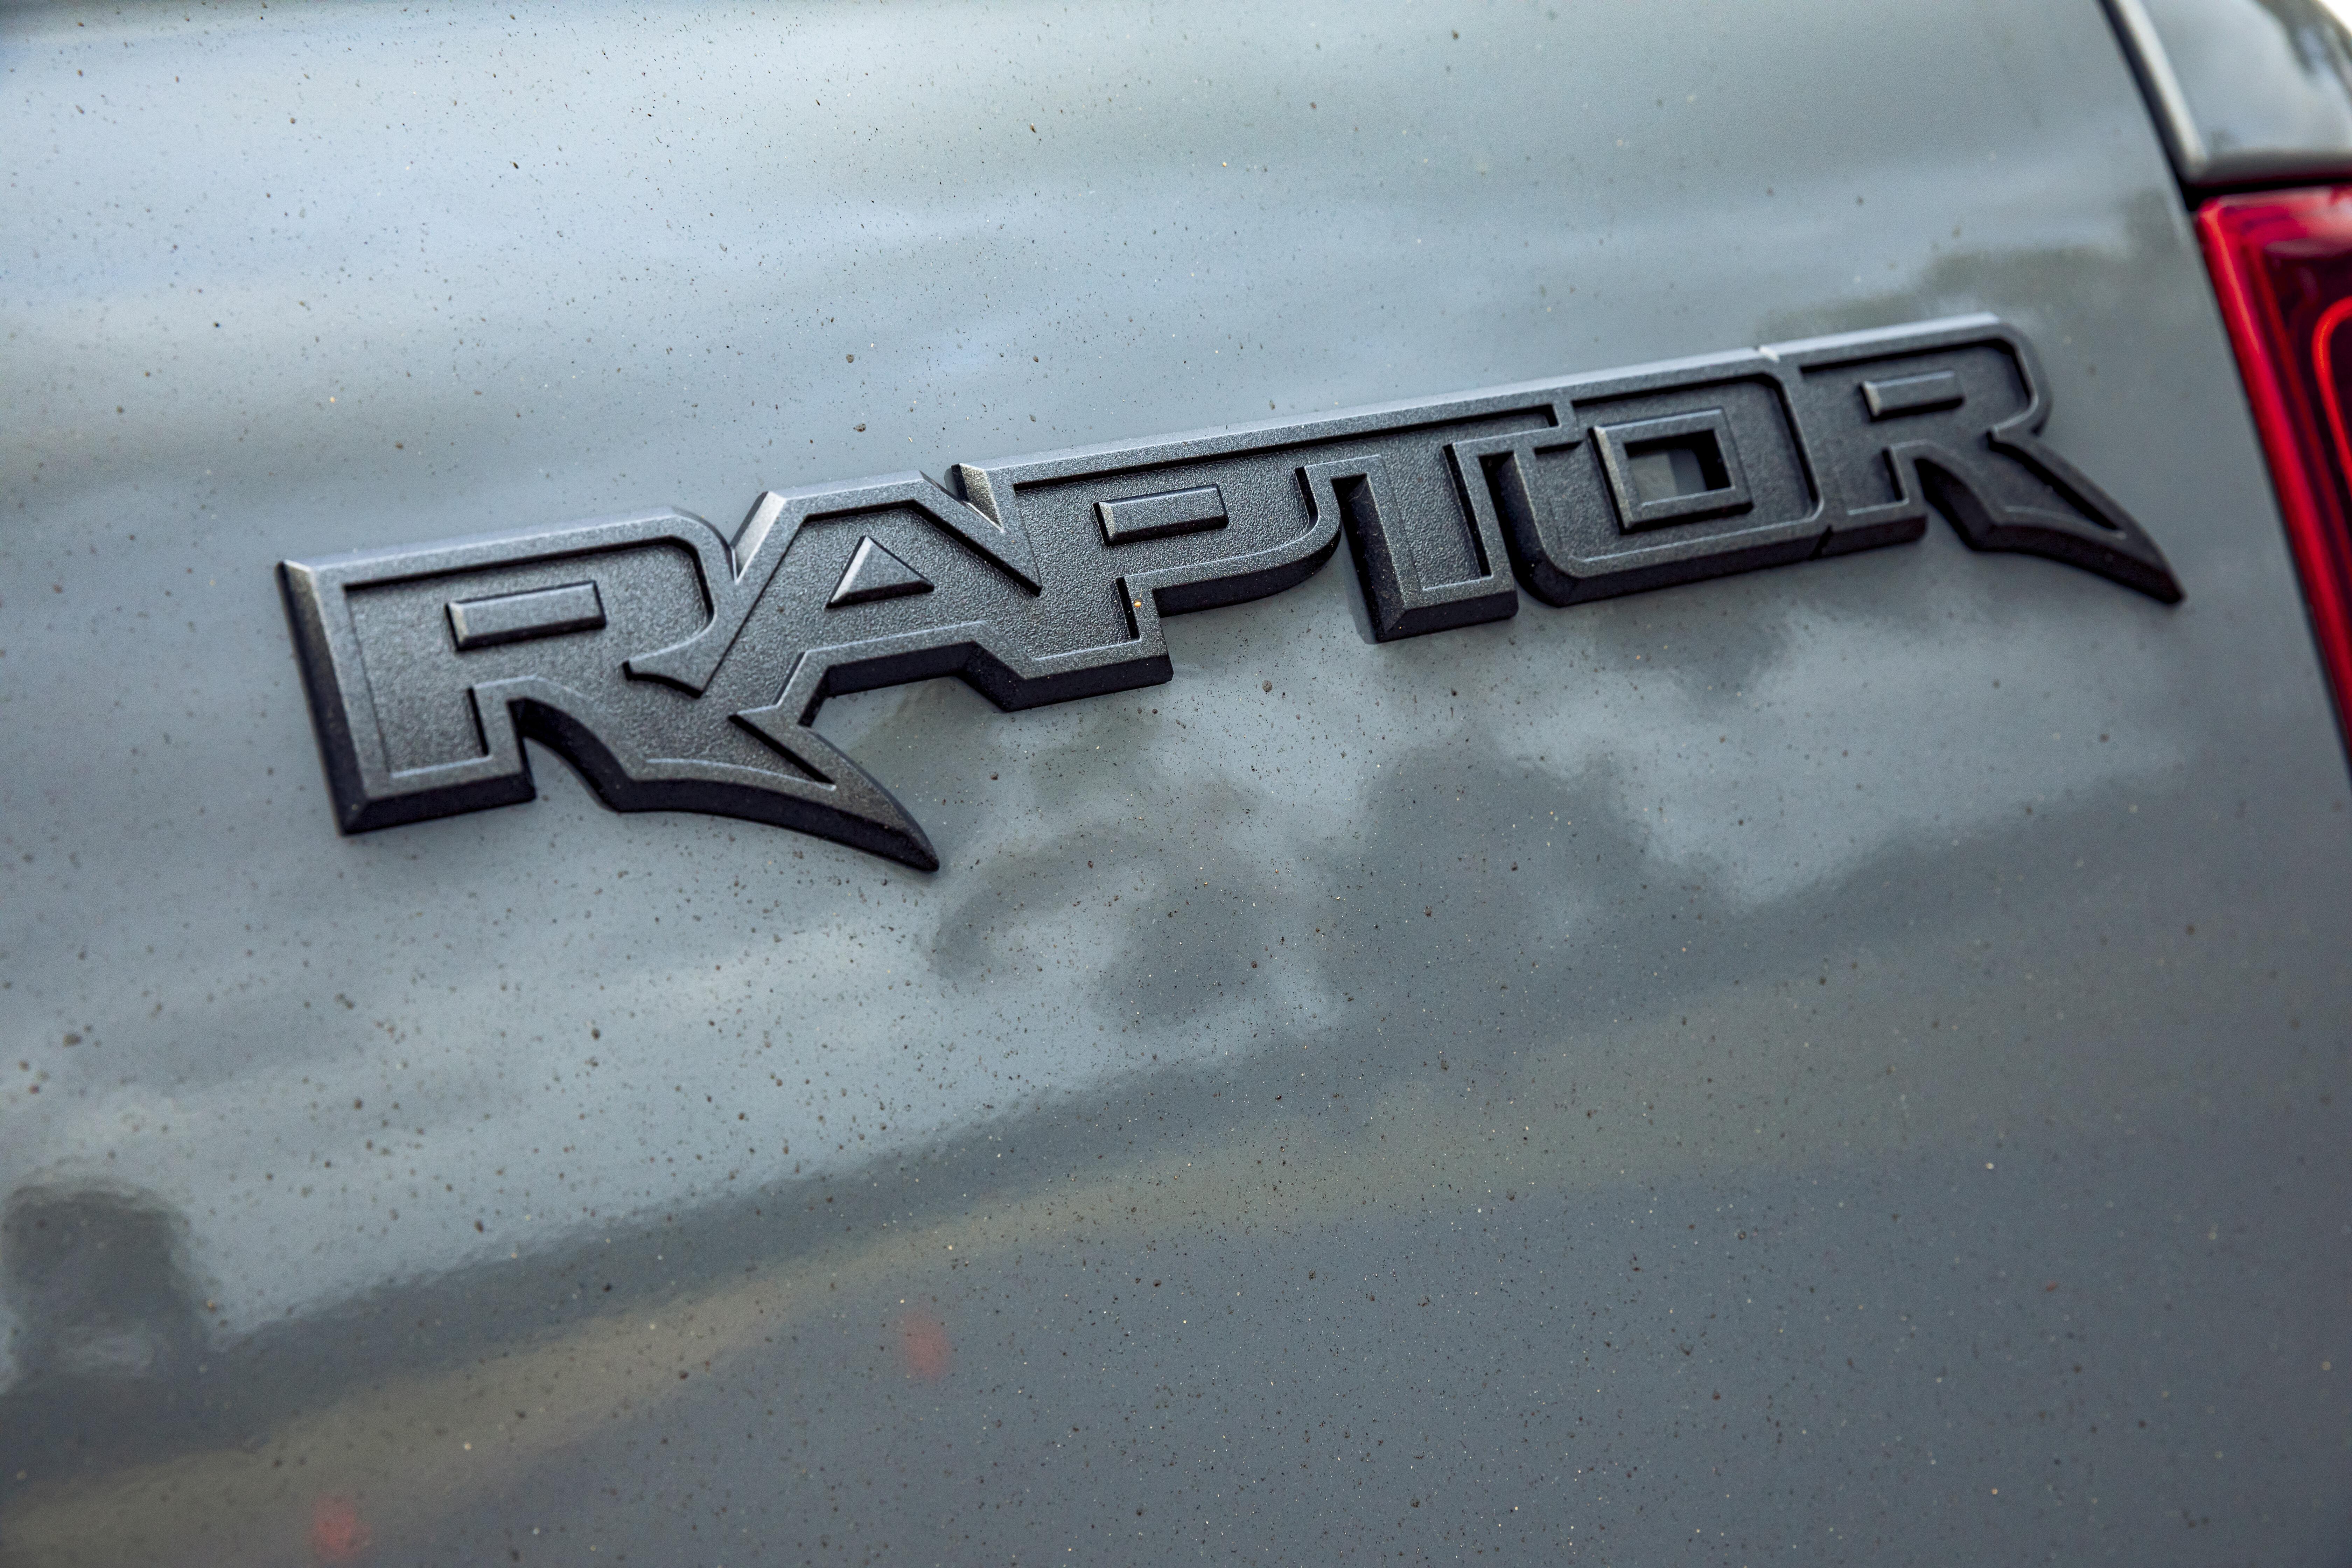 4 X 4 Australia Comparisons 2021 May 21 Ford Ranger Raptor Logo